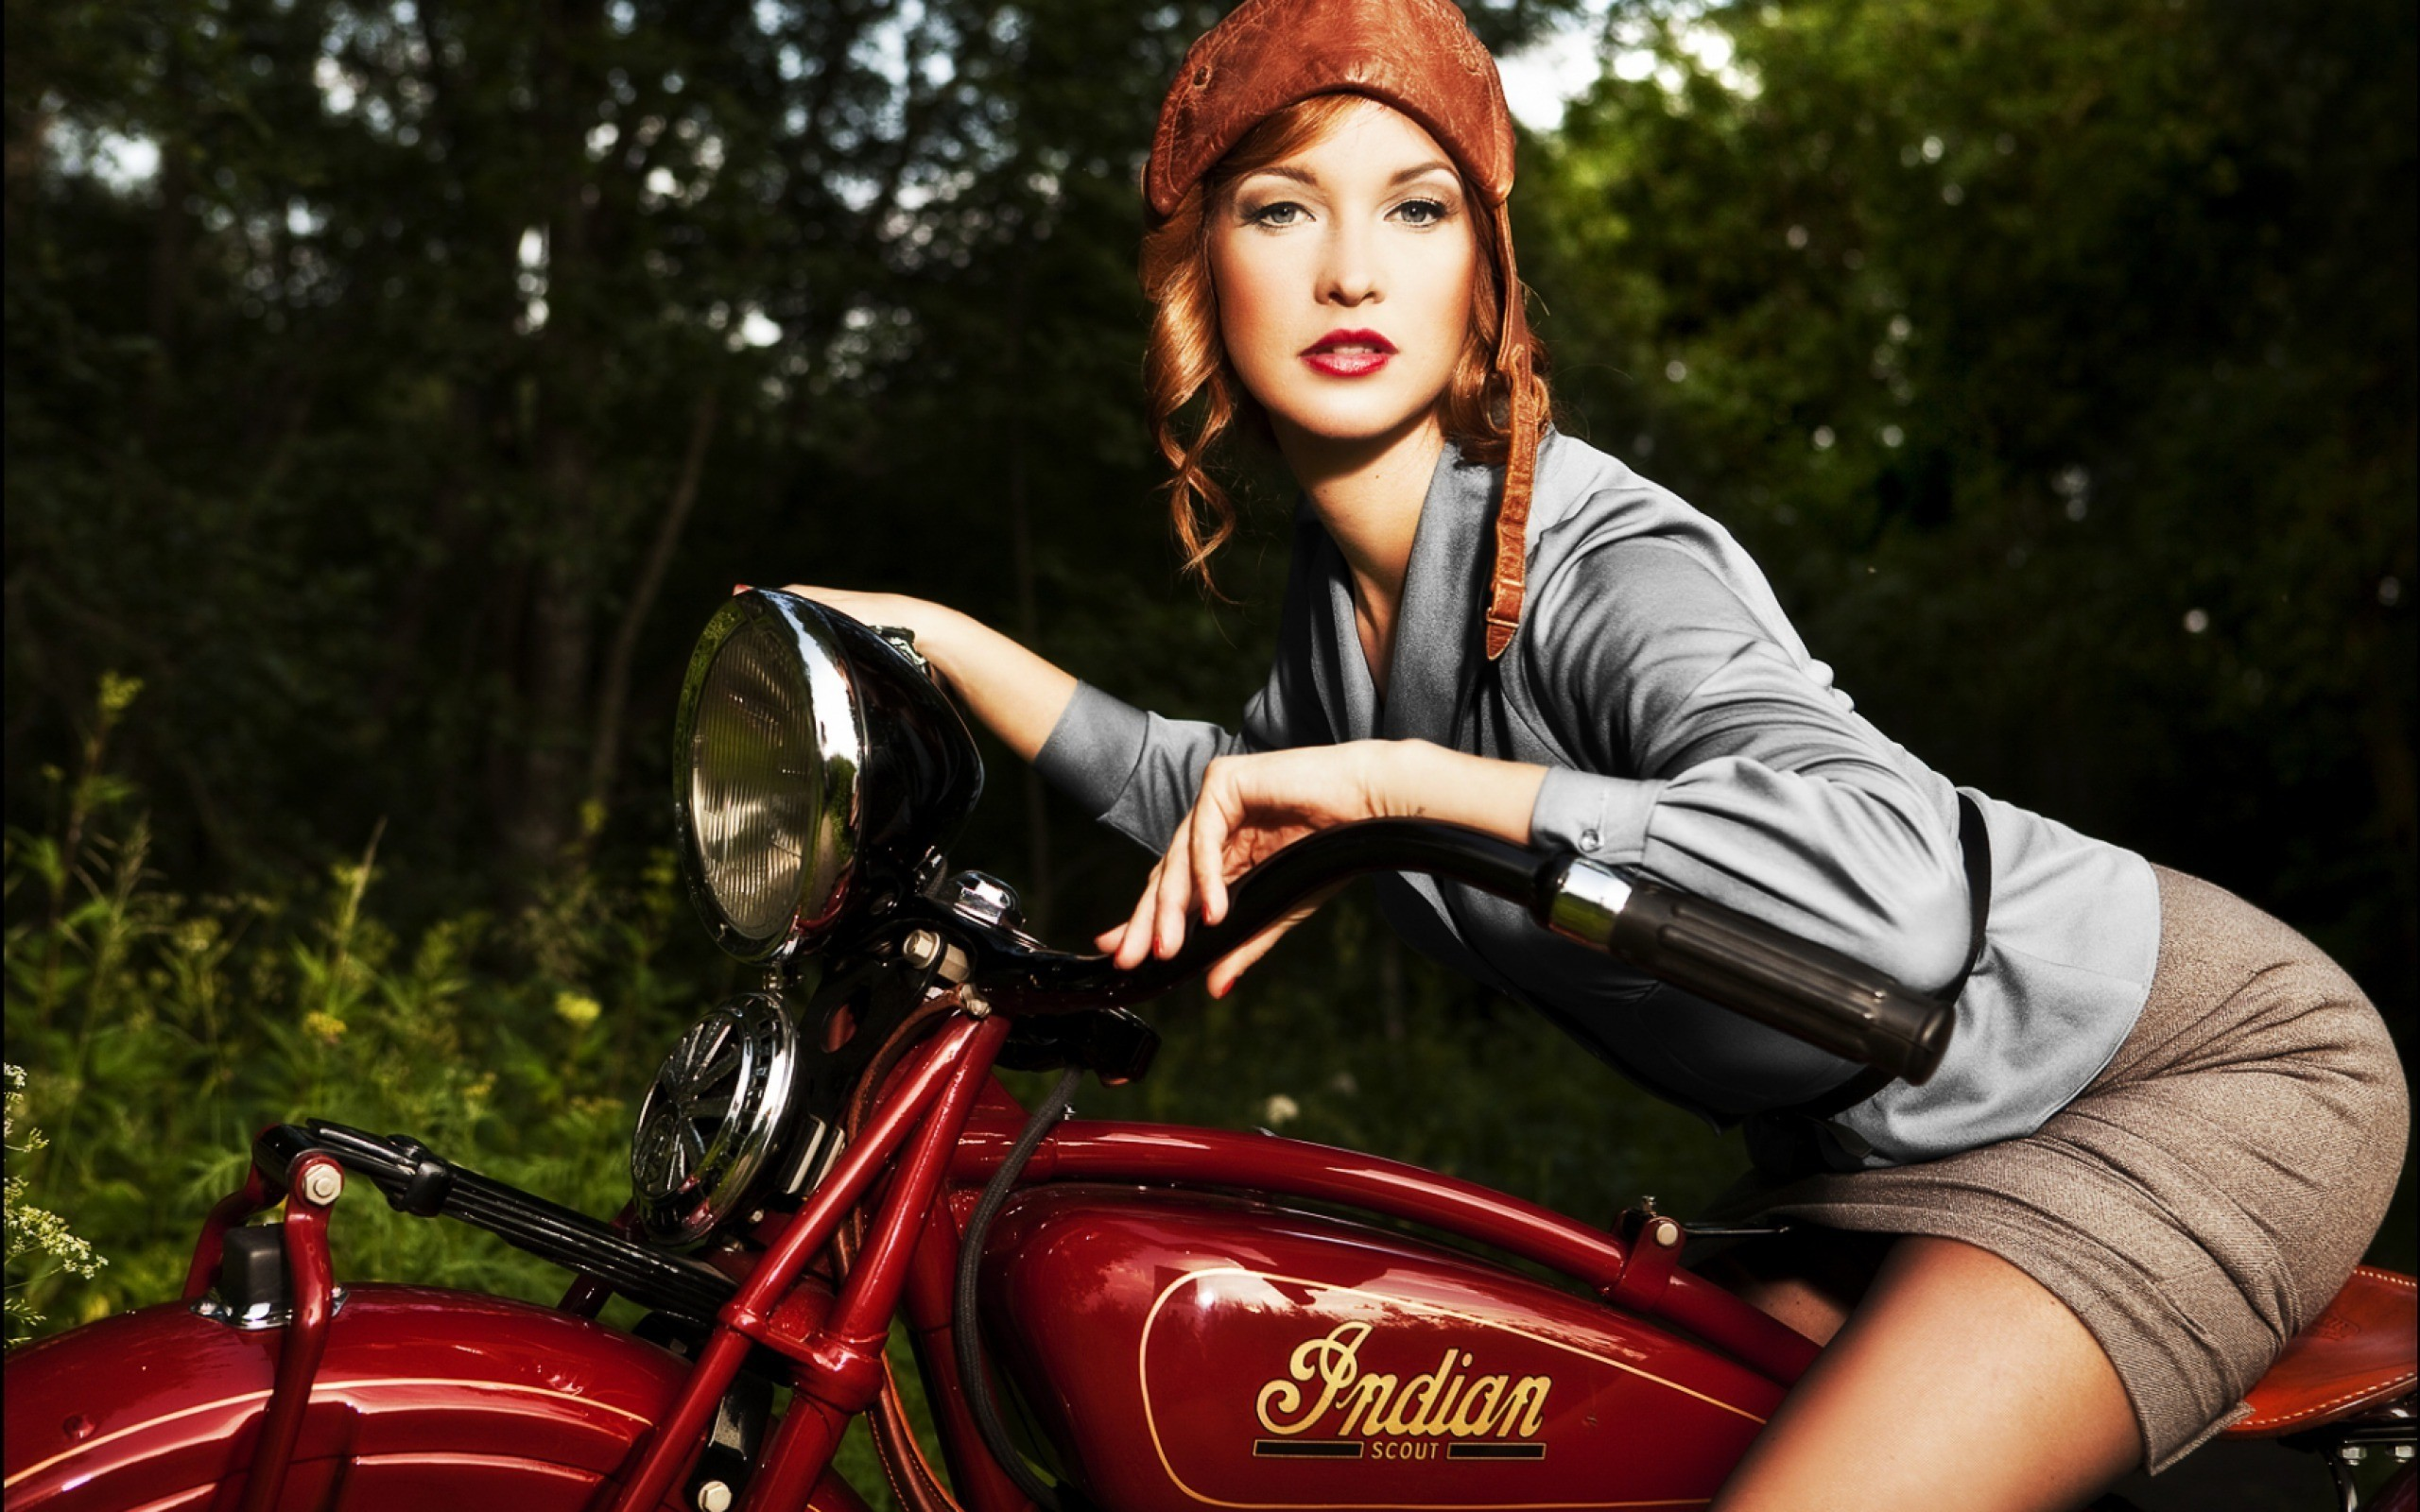 Vintage motorbikes Indian